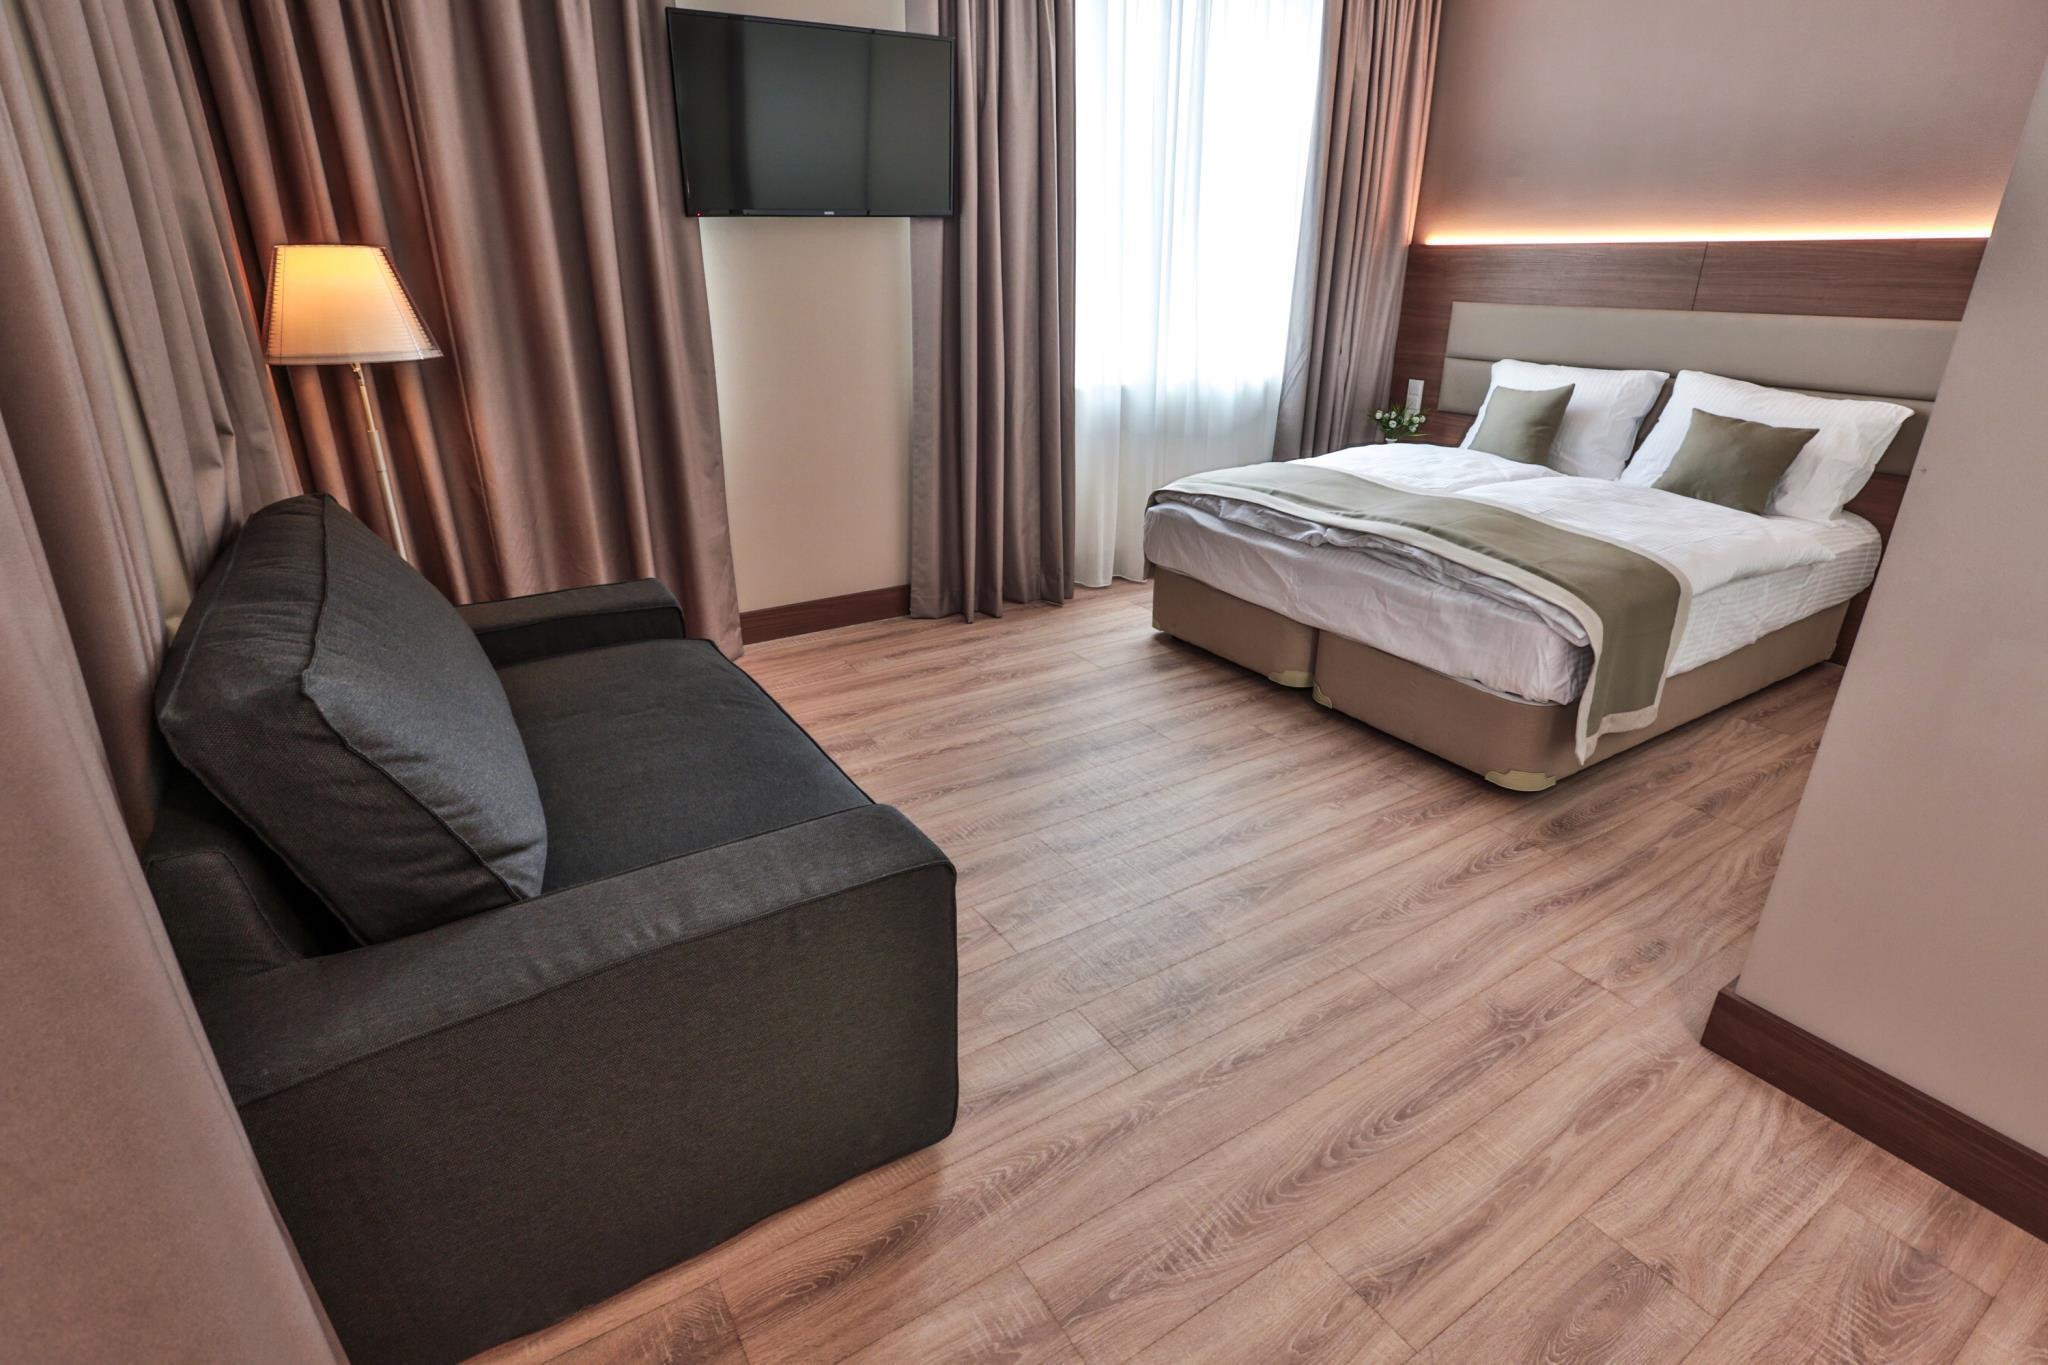 ocak apartment hotel berlin from 67 save on agoda. Black Bedroom Furniture Sets. Home Design Ideas